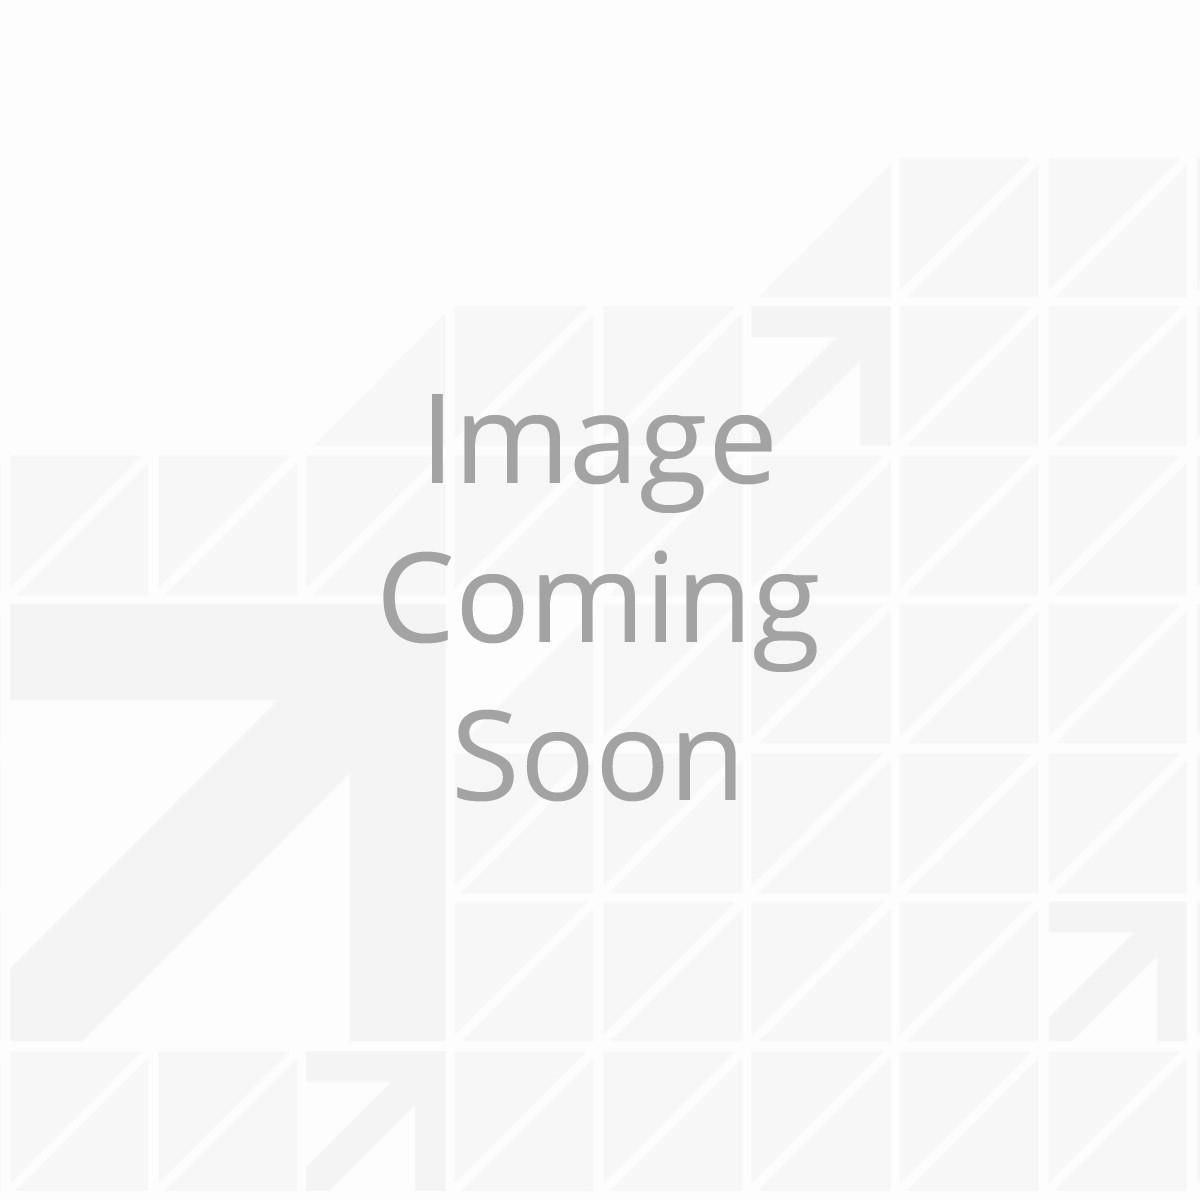 Under Armour Women's Full Zip Jacket Kelly Green